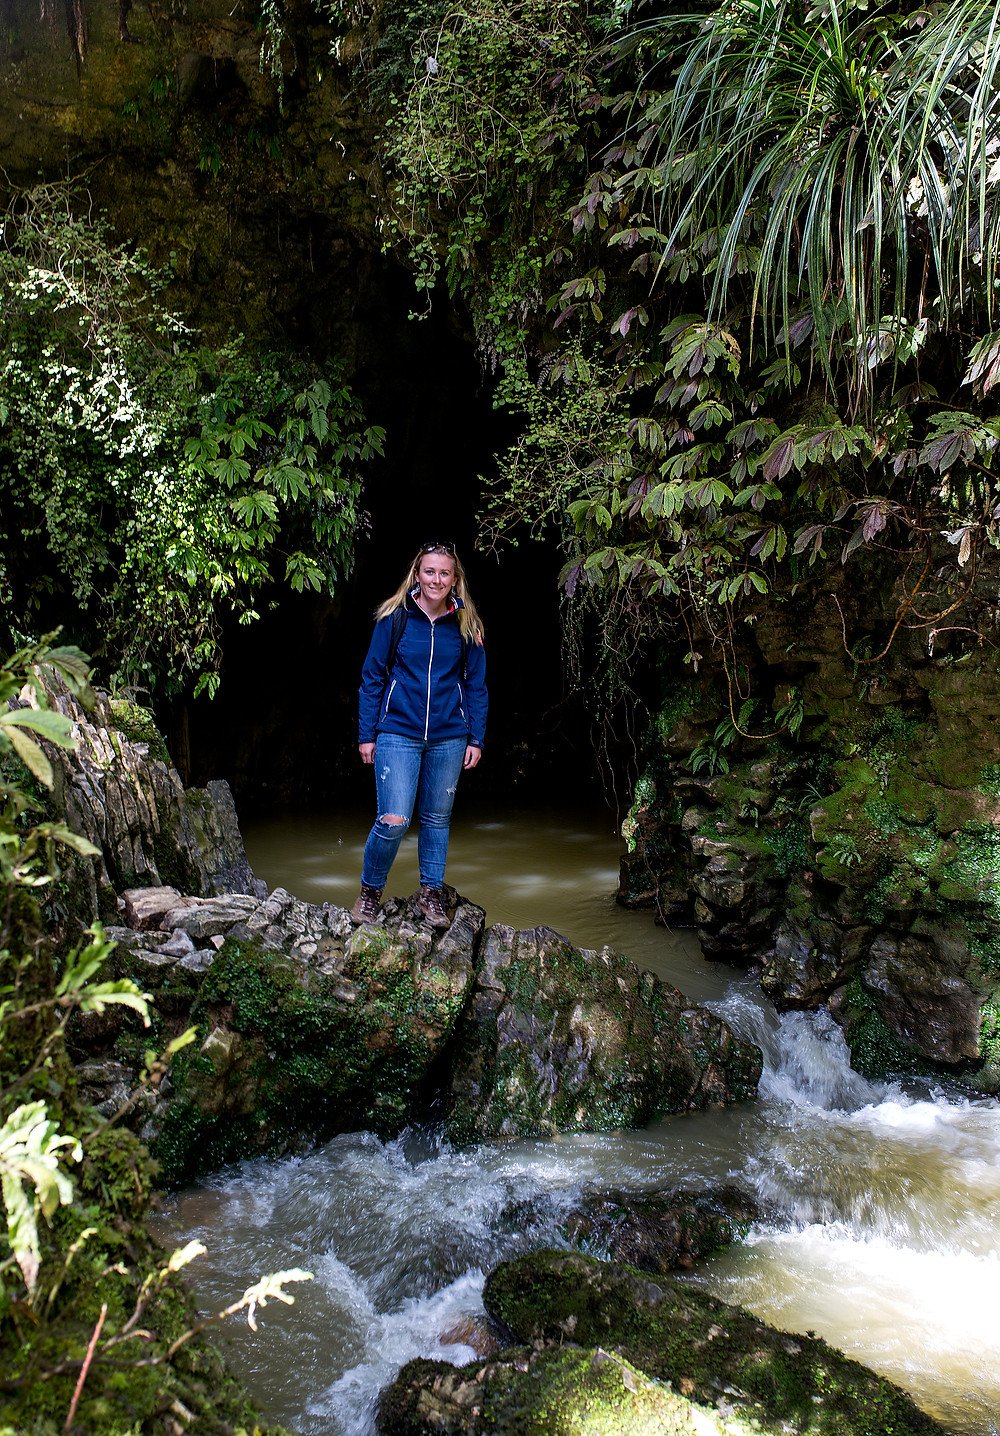 Free Waitomo forest walk in New Zealand